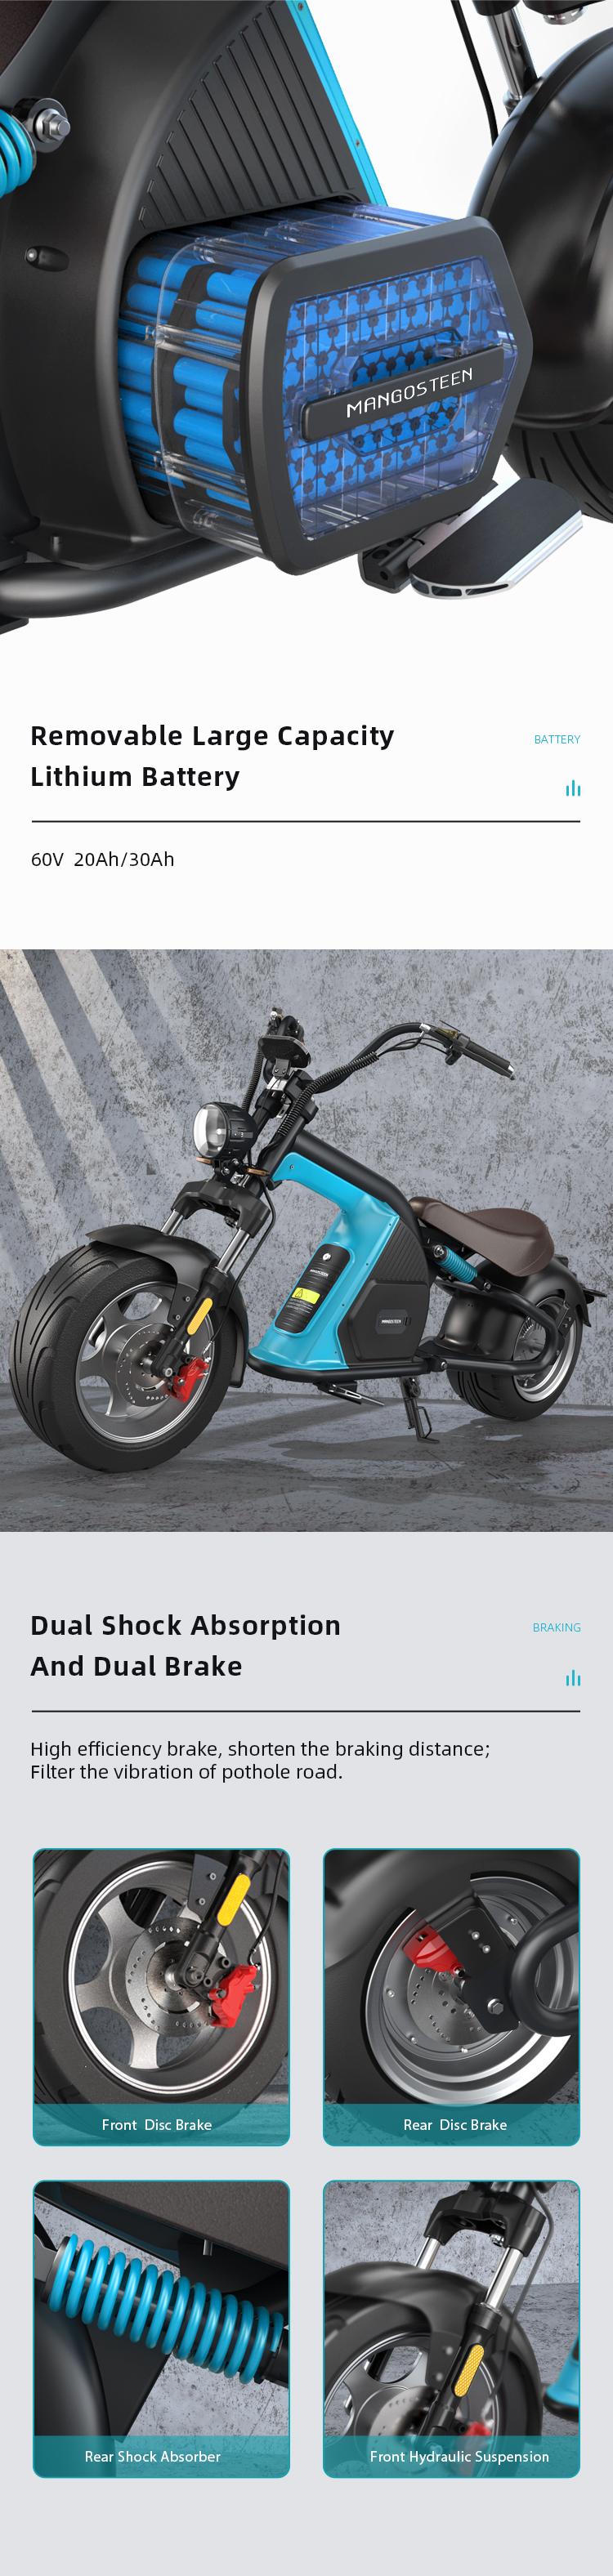 Elektroroller Harley Scooter Citycoco Elektroscooter COC EEC ROODER (2)